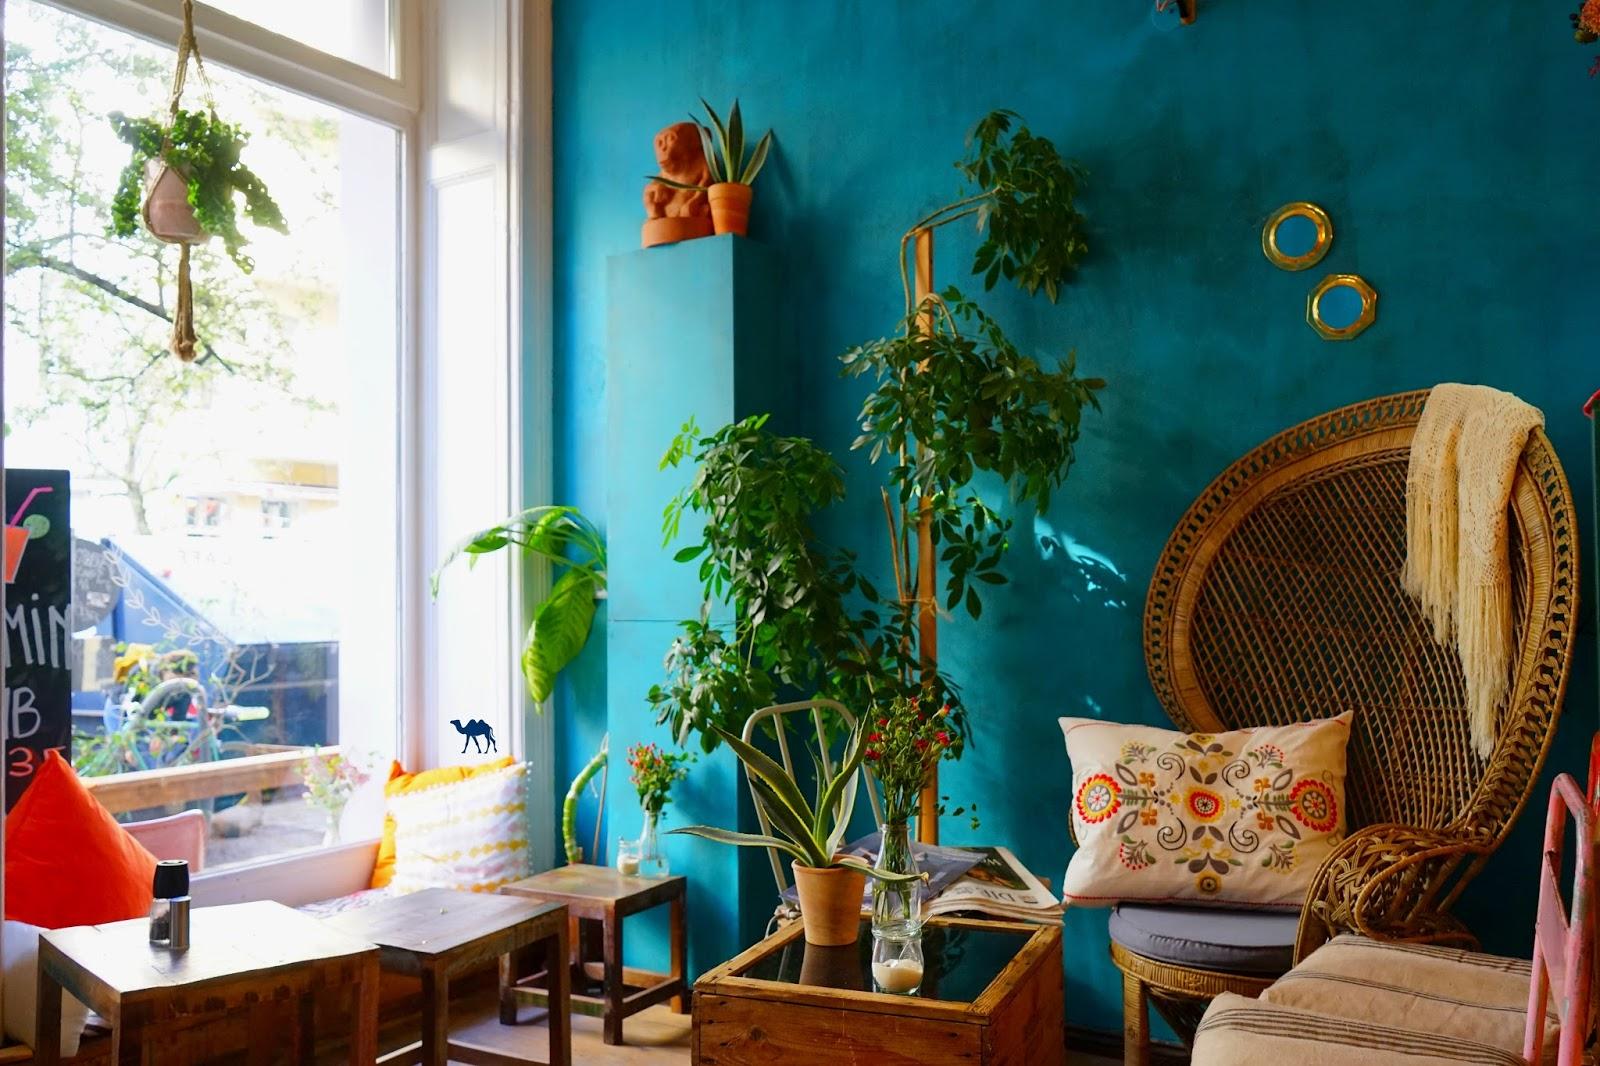 Le Chameau Bleu -  Salle Frida Cafe